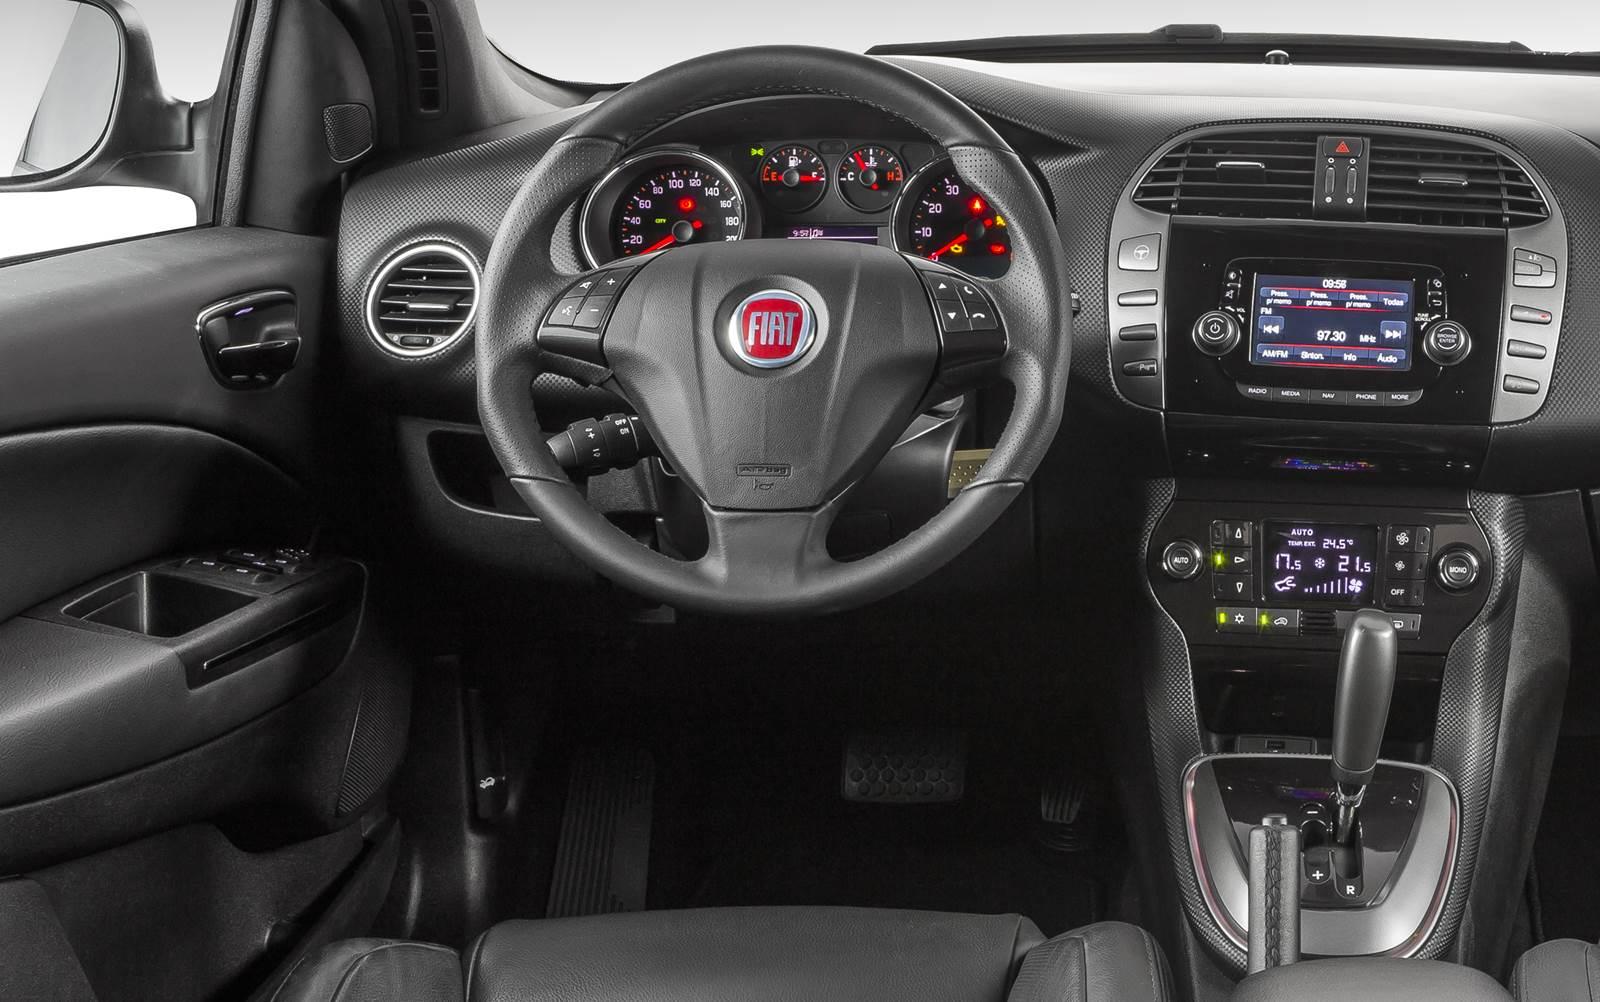 Novo Fiat Bravo Sporting 2016